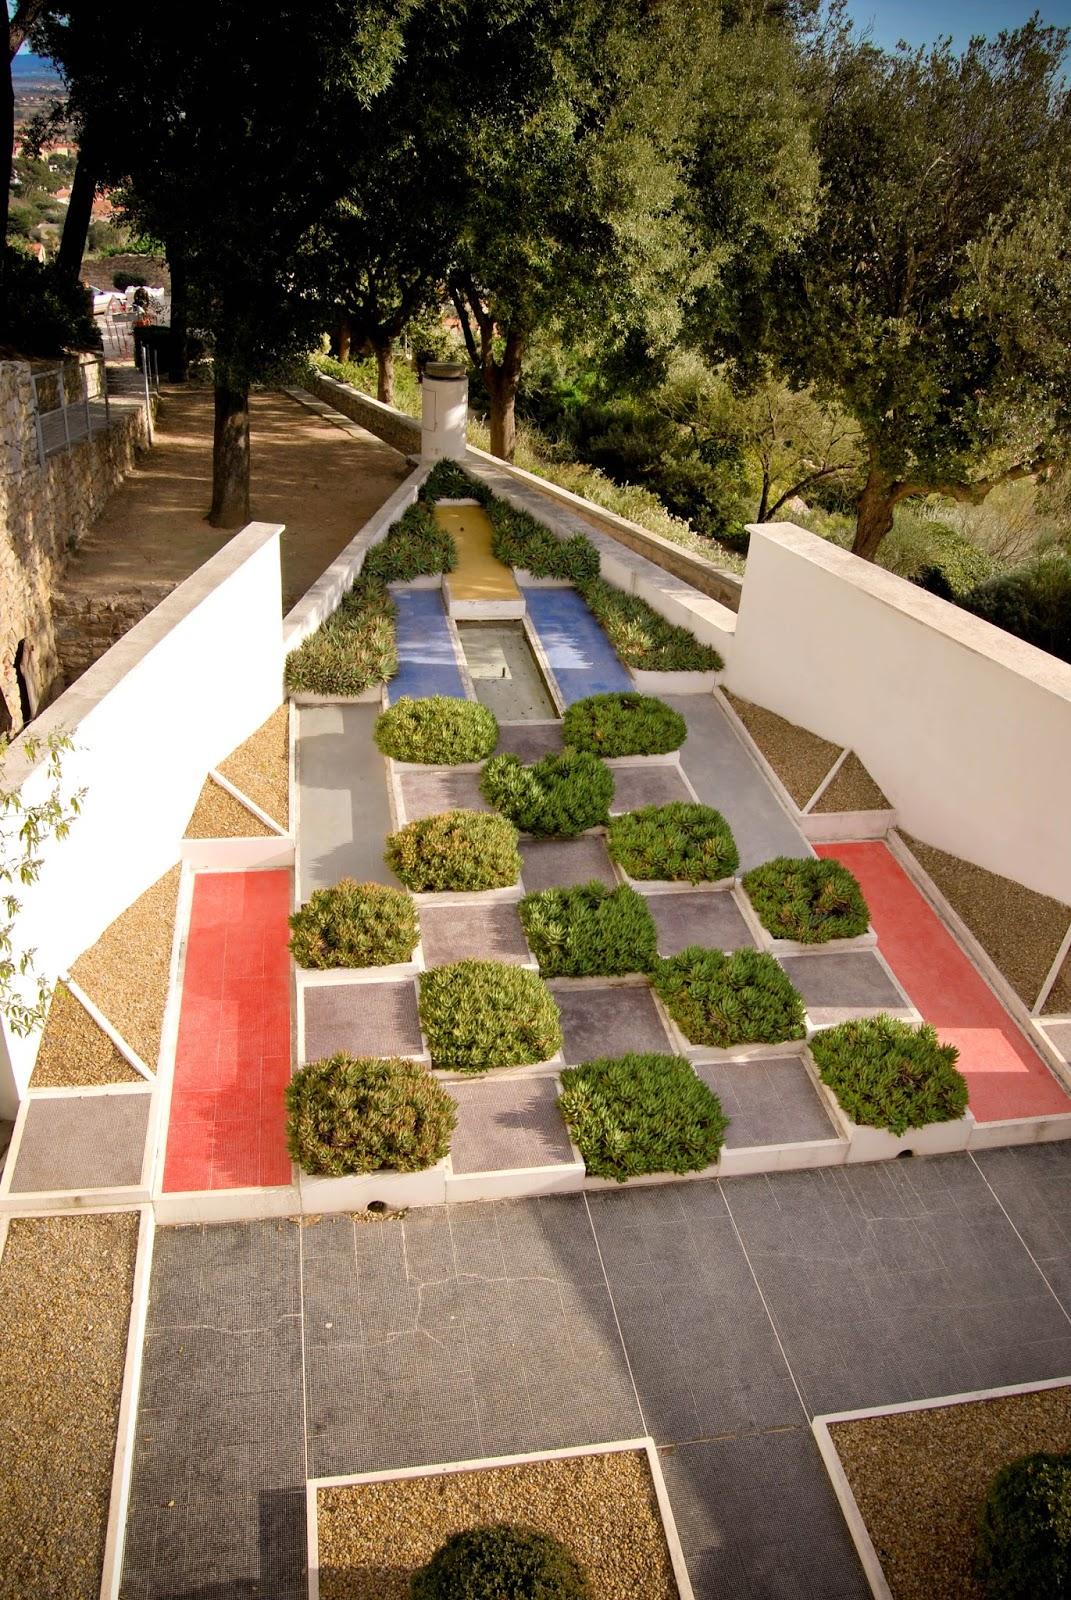 christine rochet jacob postcard from the villa noailles cubist garden hyeres france. Black Bedroom Furniture Sets. Home Design Ideas